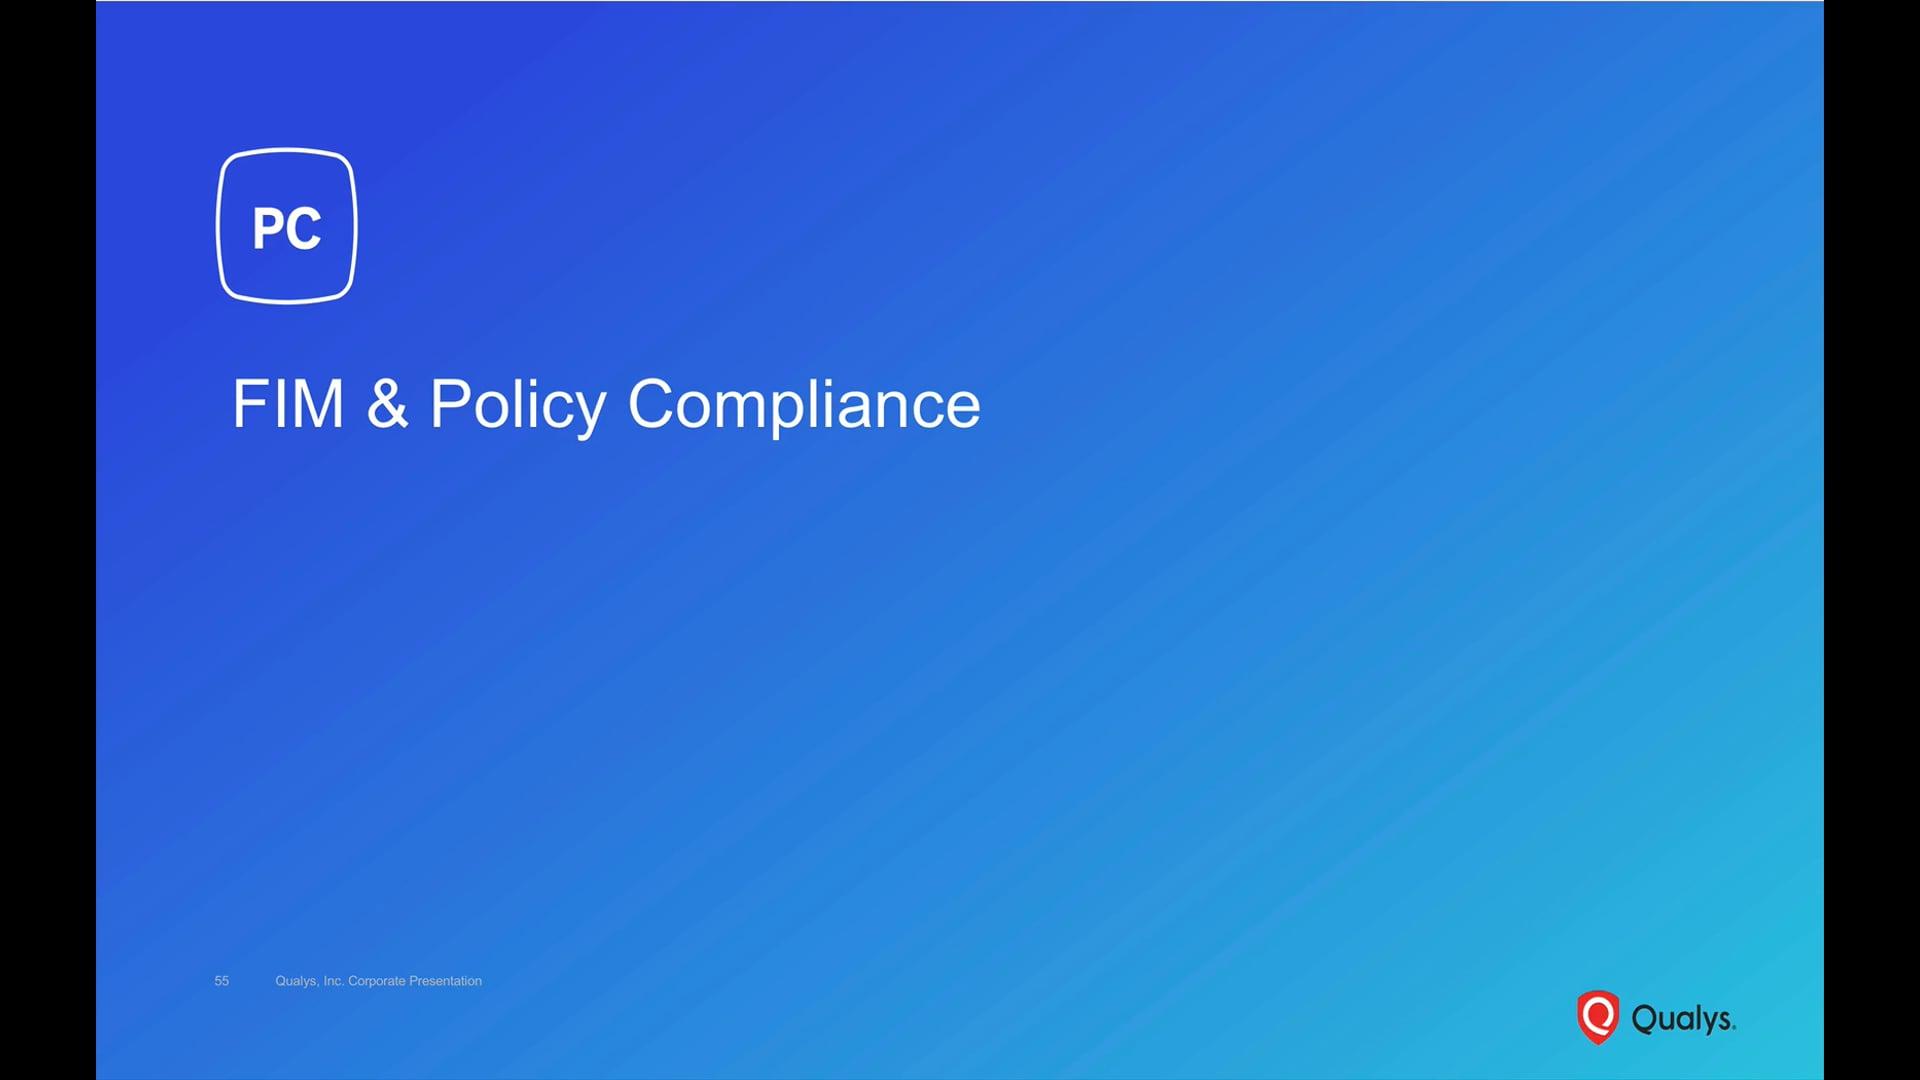 FIM & Policy Compliance